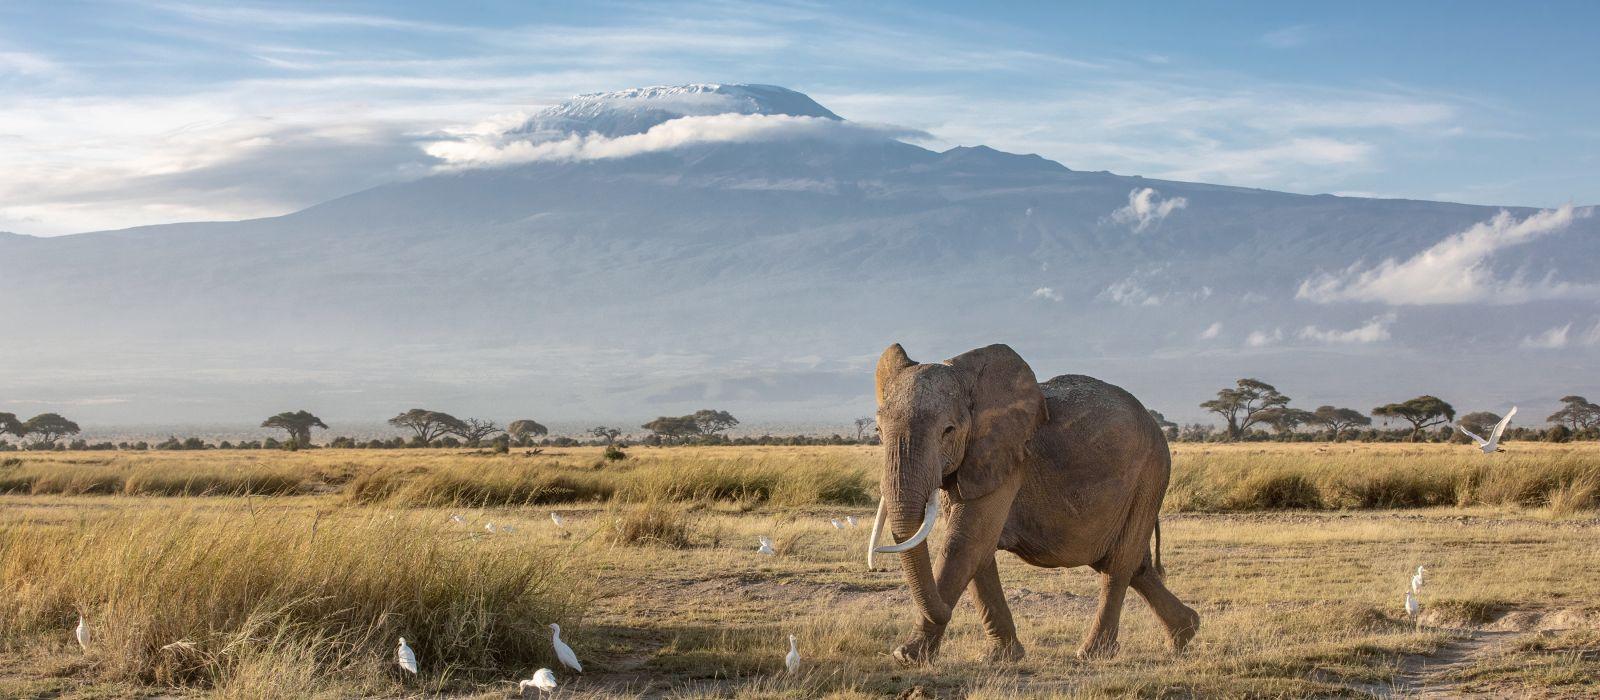 Tanzania Travel | Your Tanzania Safari with Enchanting Travels